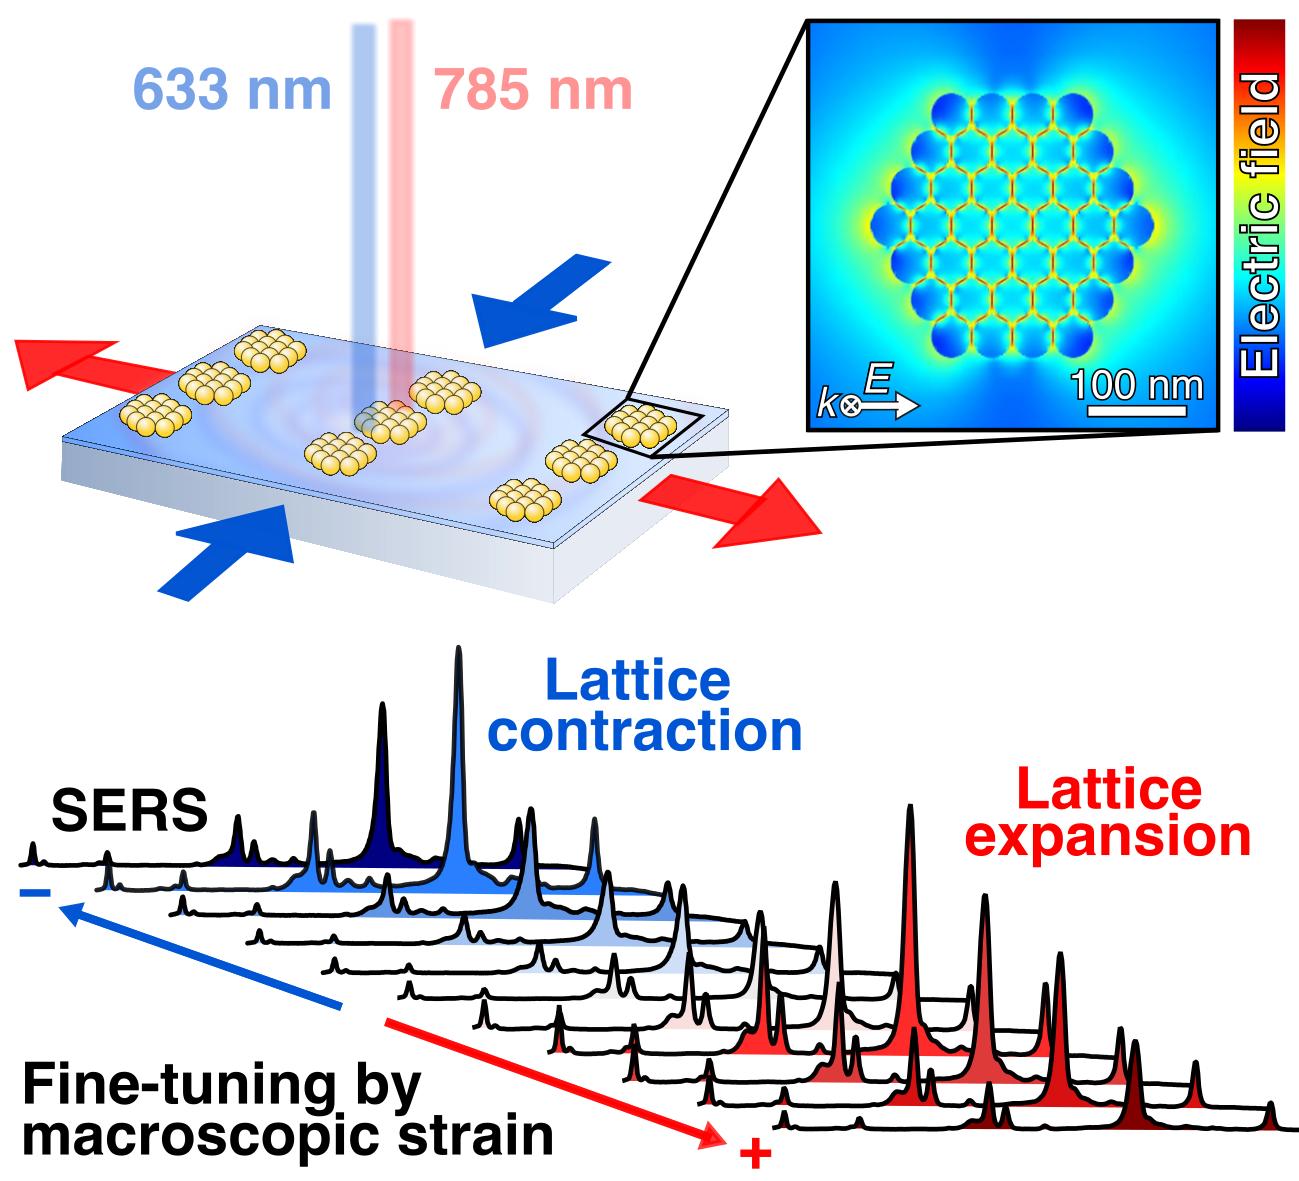 Mechanically Tunable Lattice-Plasmon Resonances by Templated Self-Assembled Superlattices for Multi-Wavelength Surface-Enhanced Raman Spectroscopy